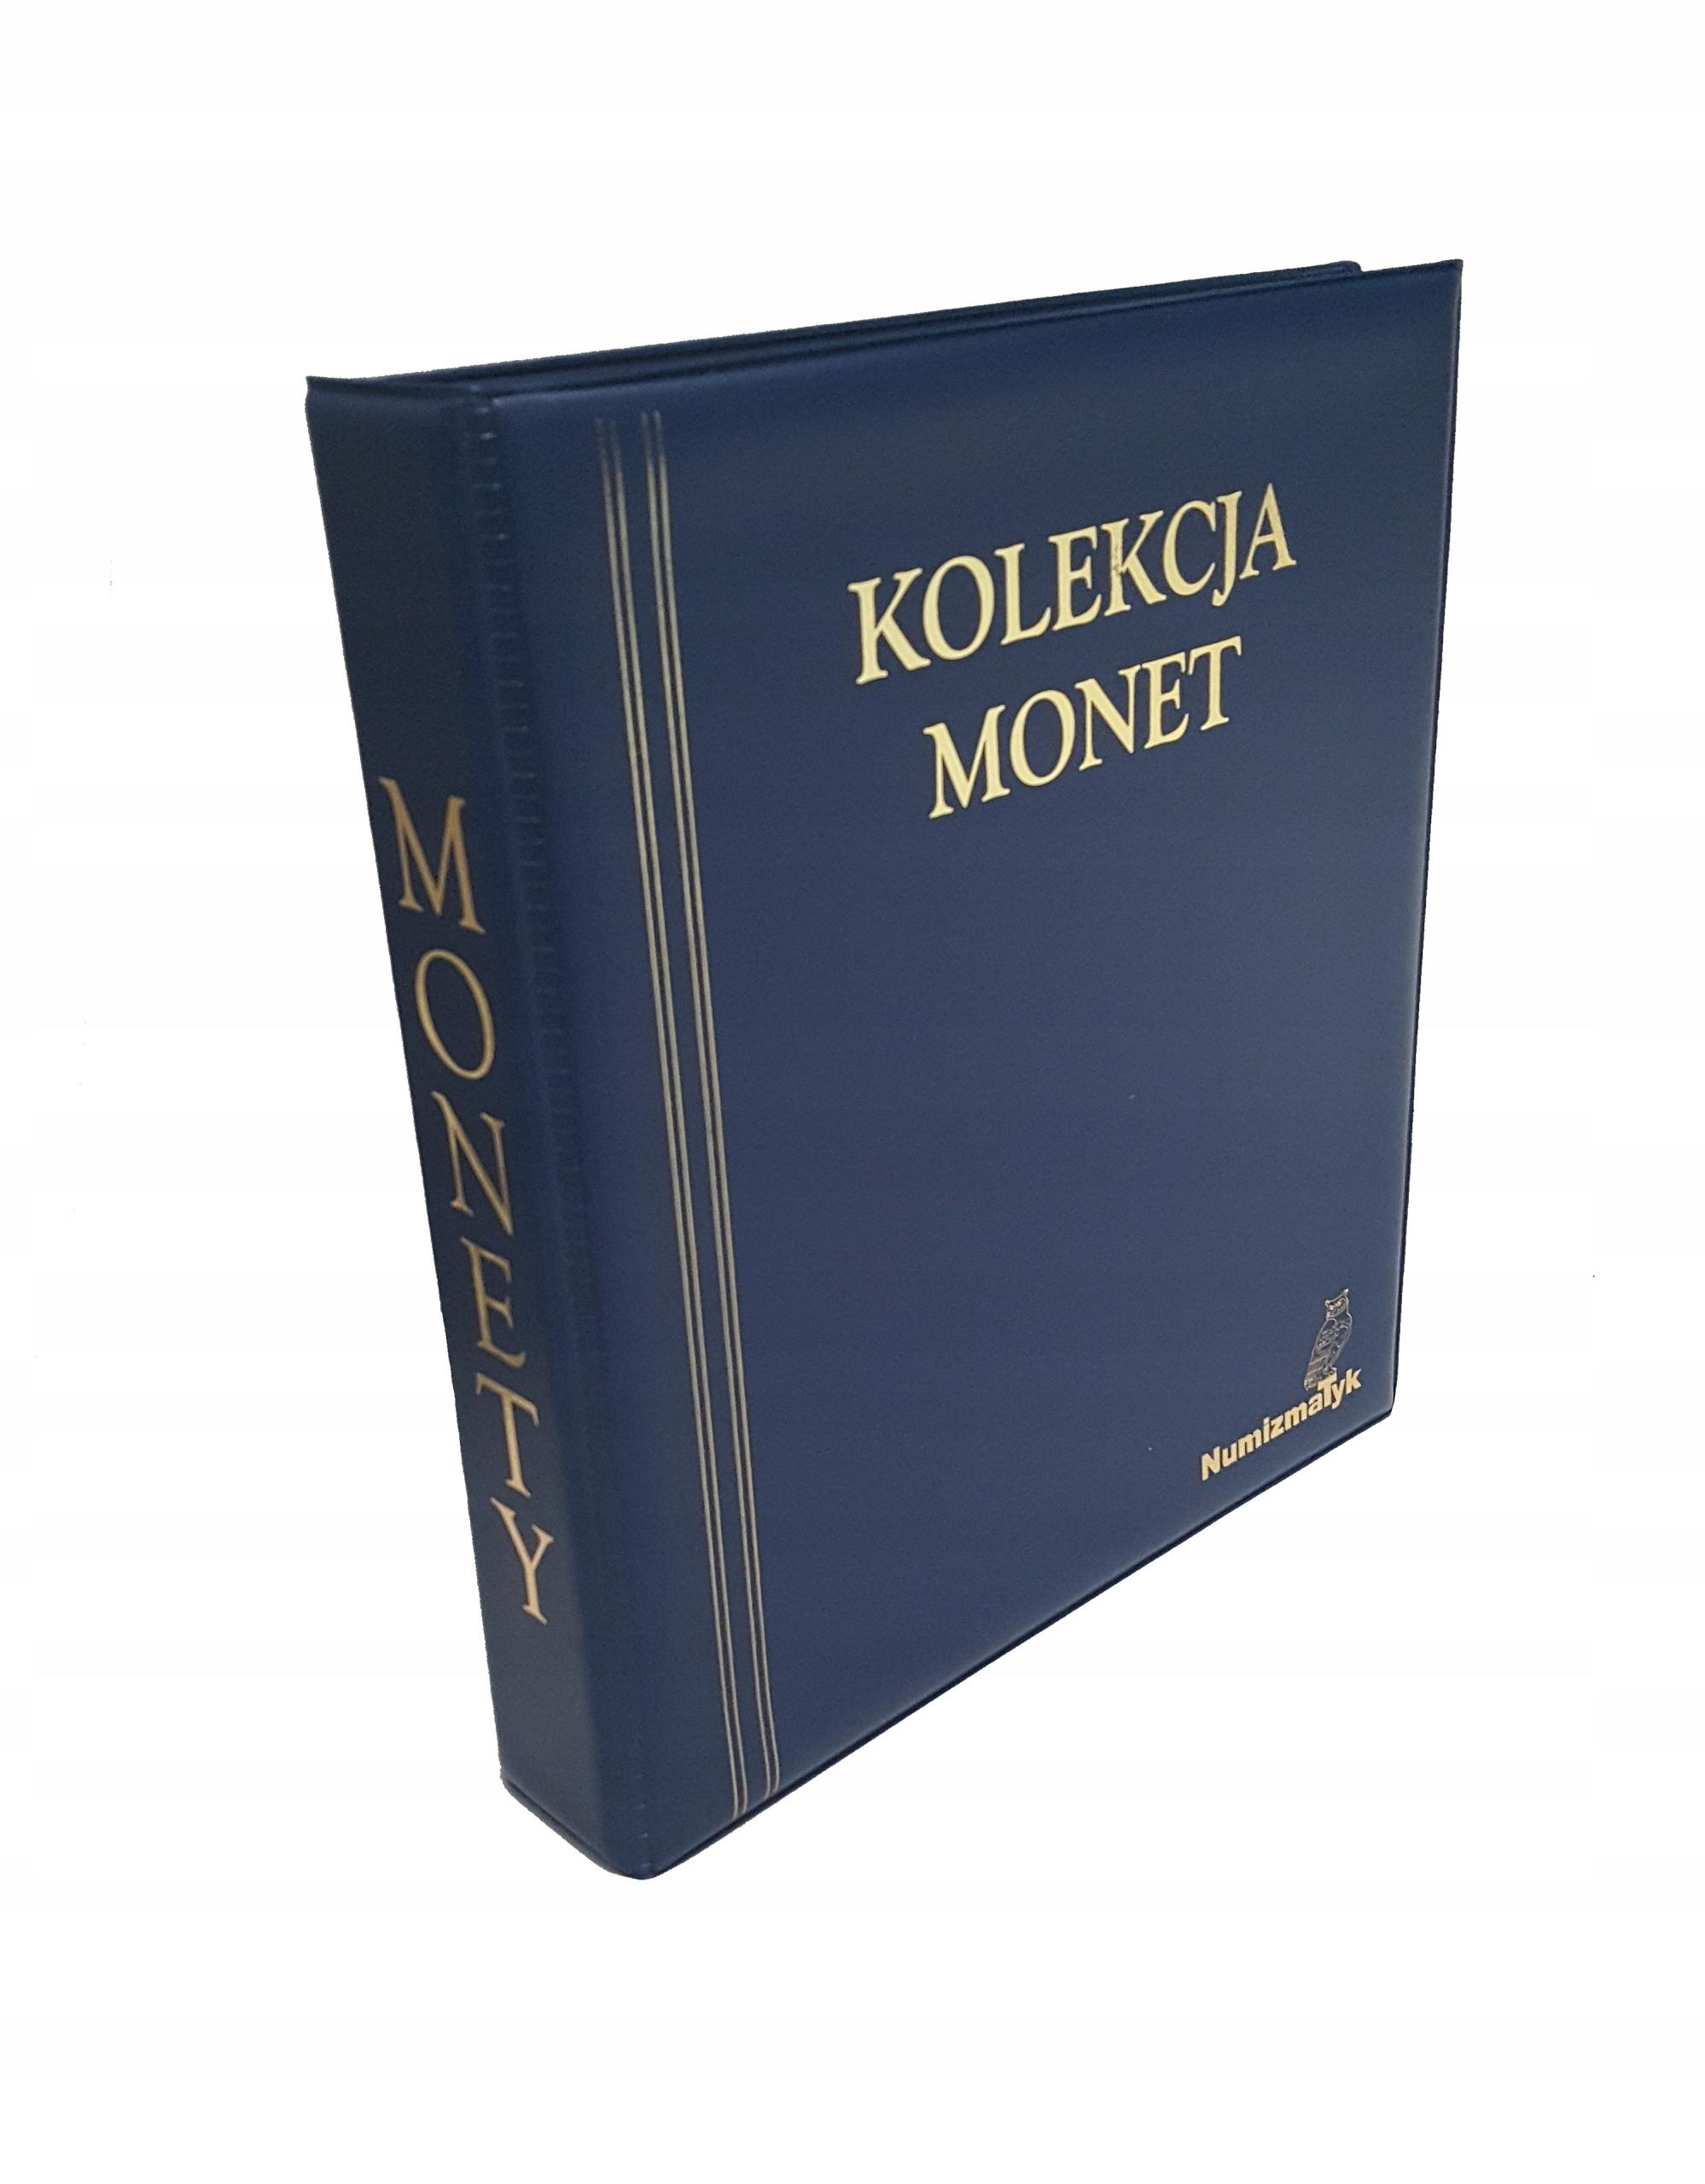 ALBUM CLASSER НА 300 МОНЕТ 2 PLN, 5 PLN 2 евро ШАНС